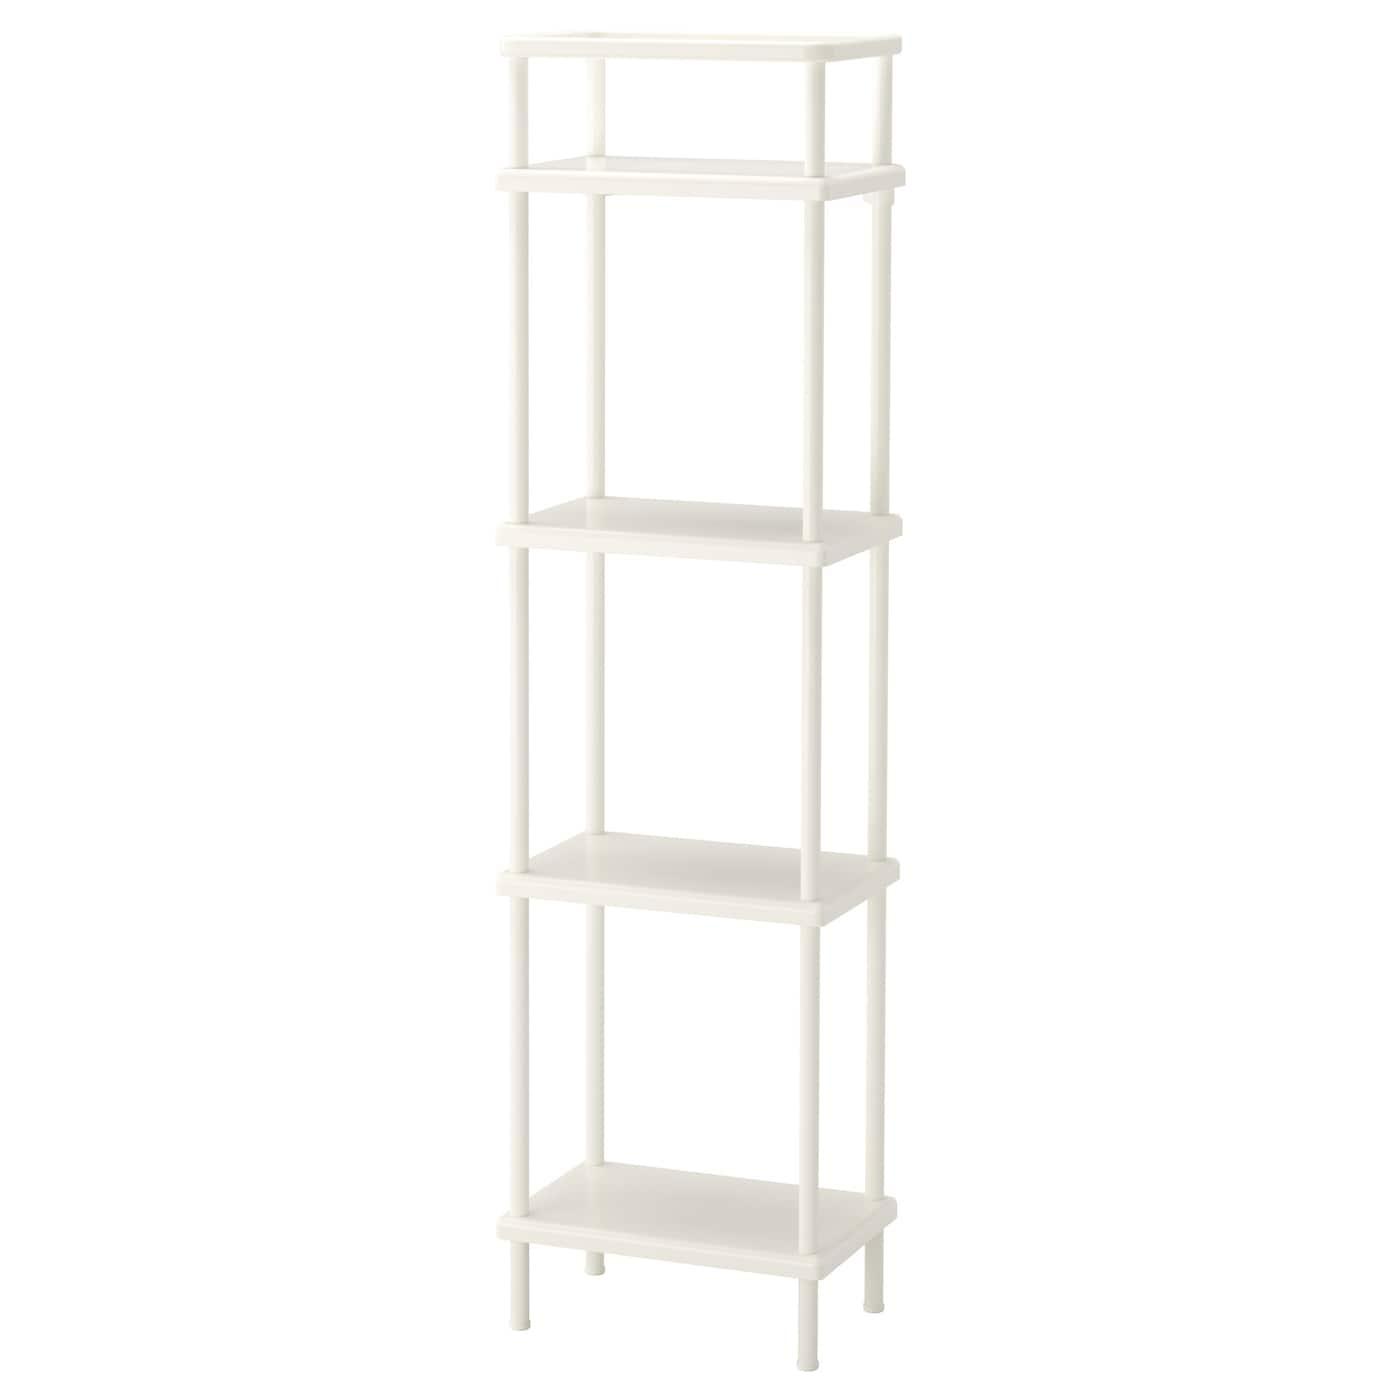 Dynan Estanteria Blanco 40 X 27 X 148 Cm Ikea